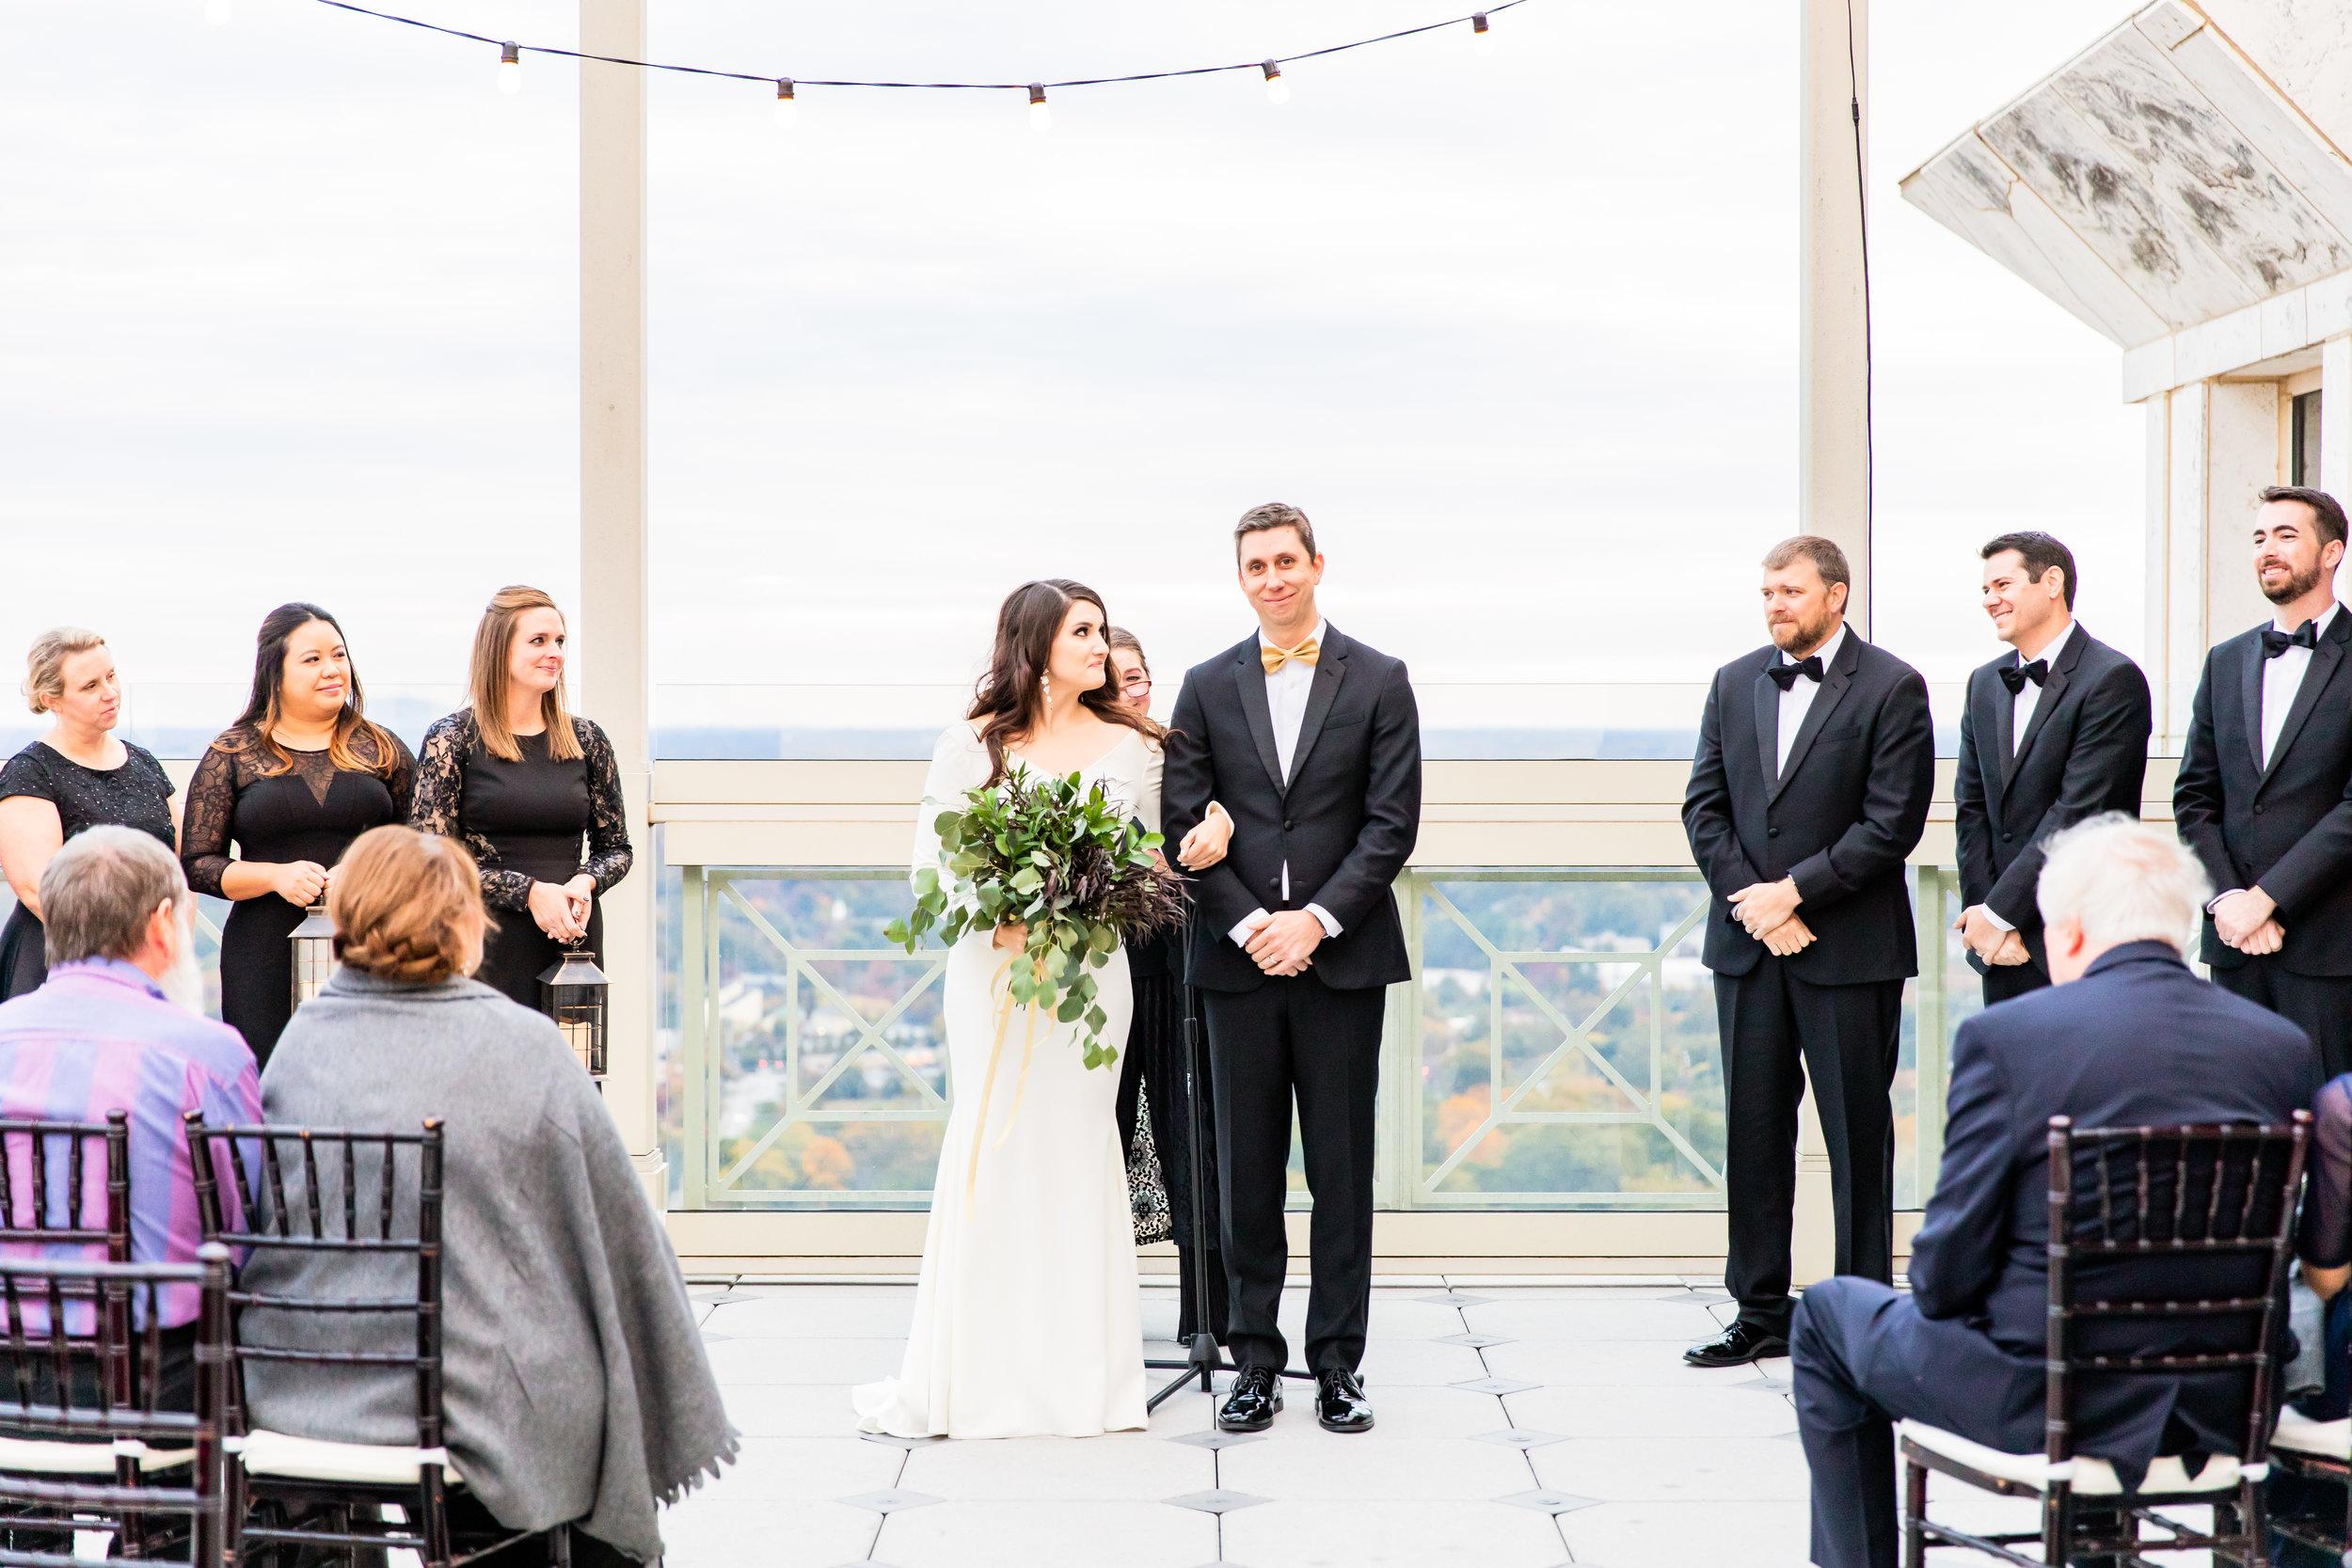 Wedding_Atlanta_Emily_Lester_Photography-609.jpg